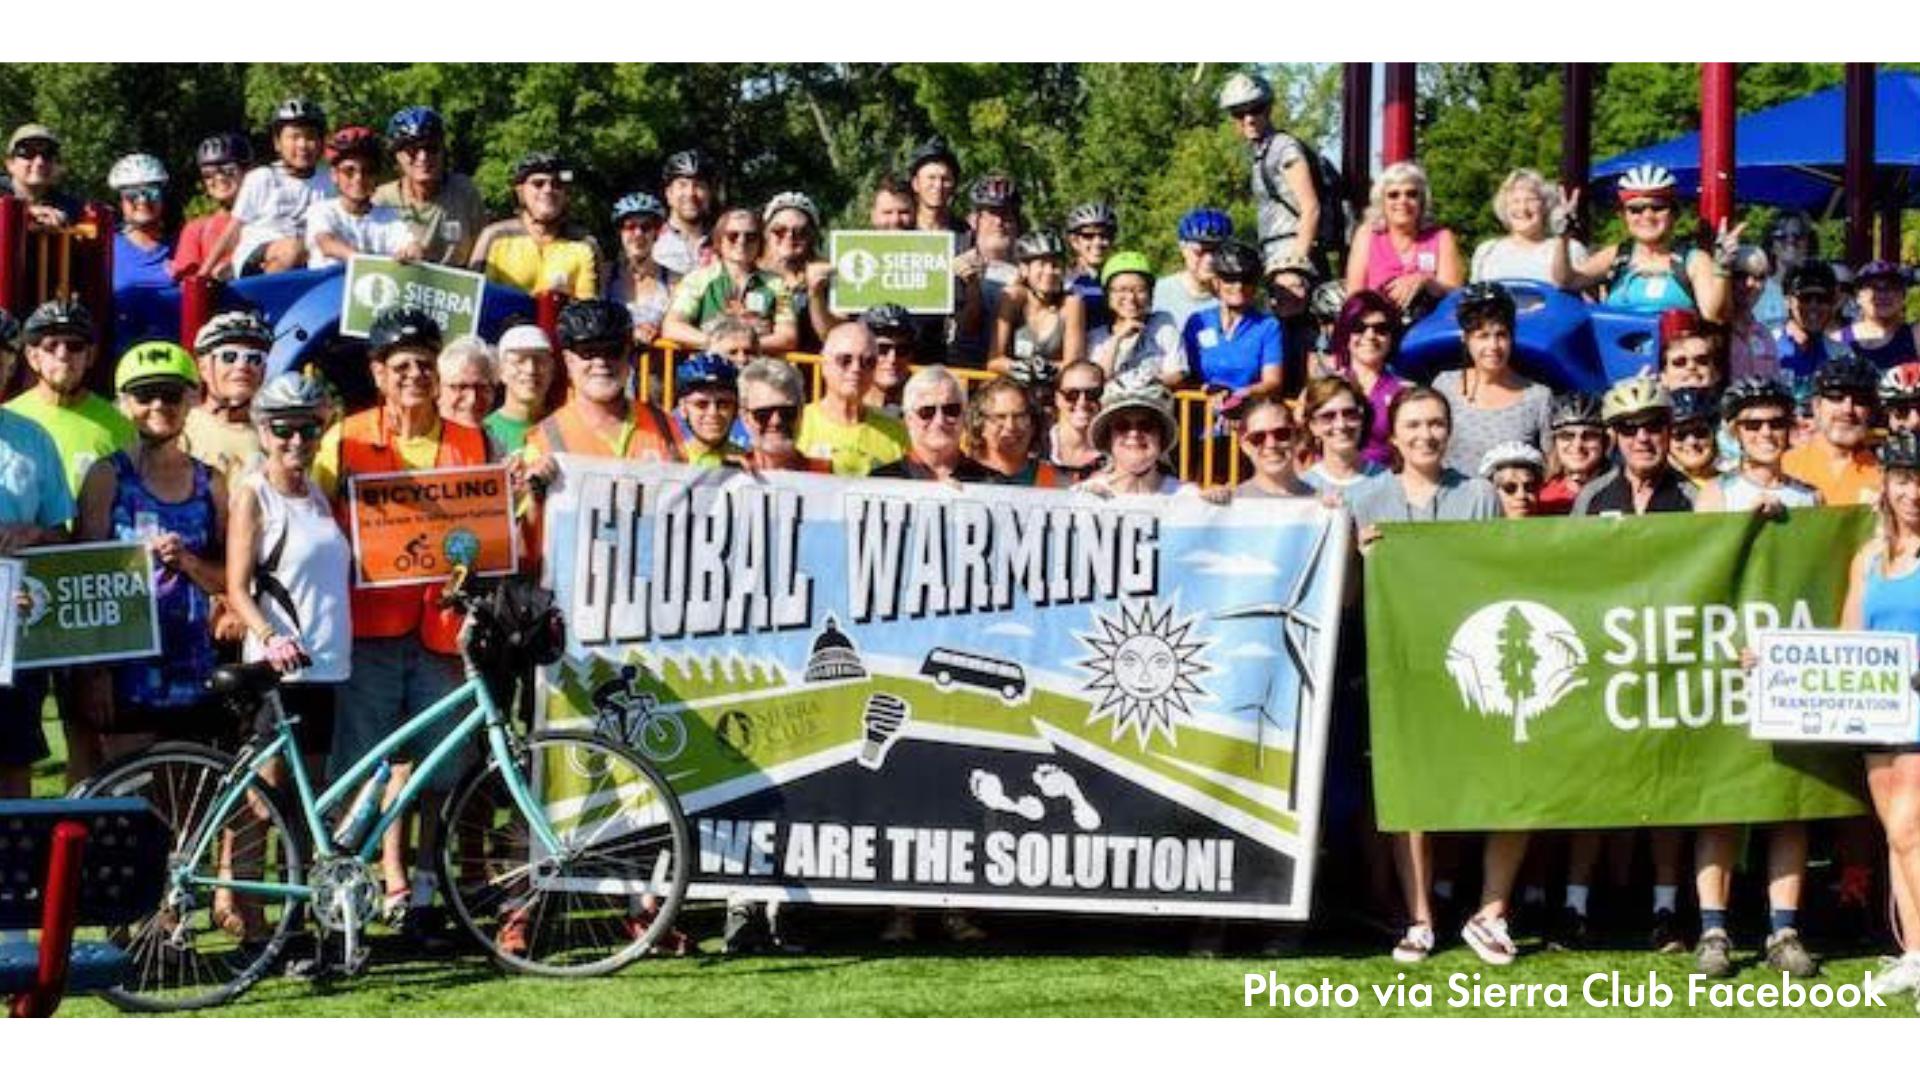 folks gathered behing sierra club banner